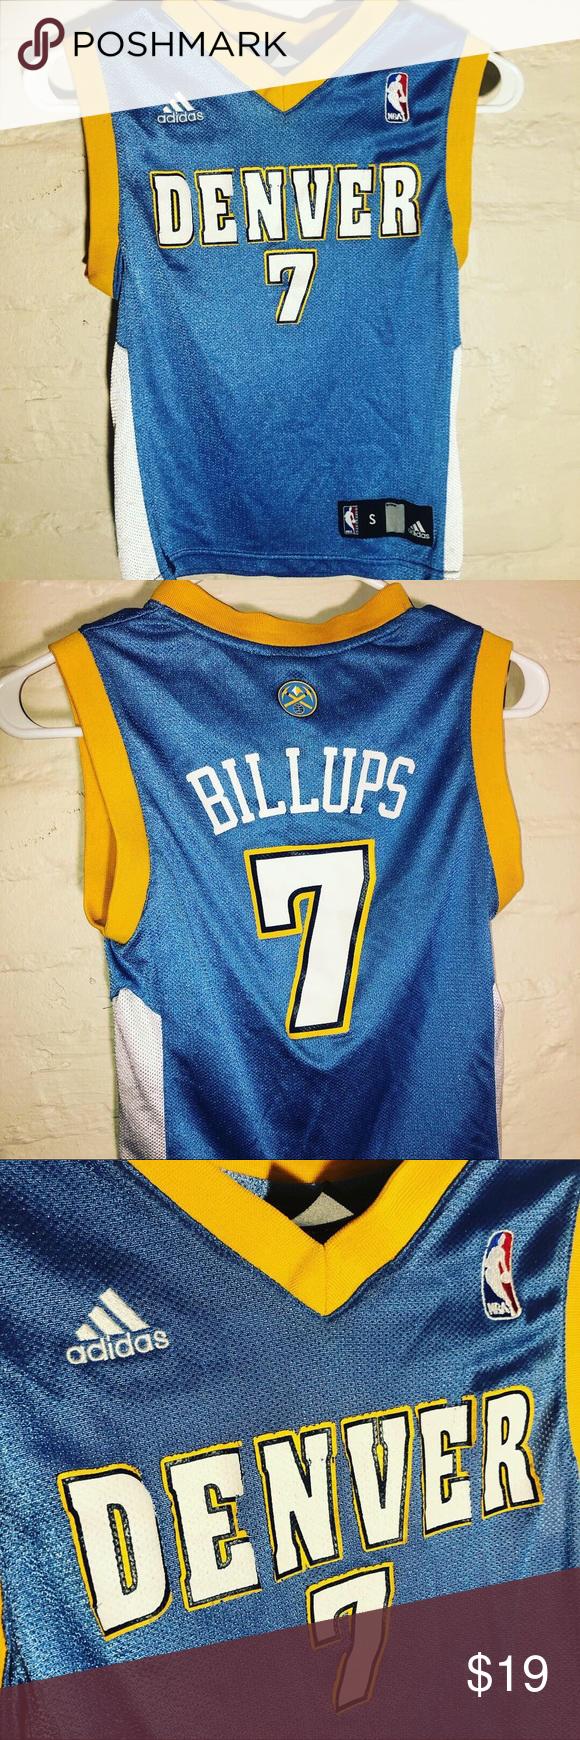 quality design 8bafc 1ebe6 Denver Nuggets NBA Basketball Jersey Adidas Small ...